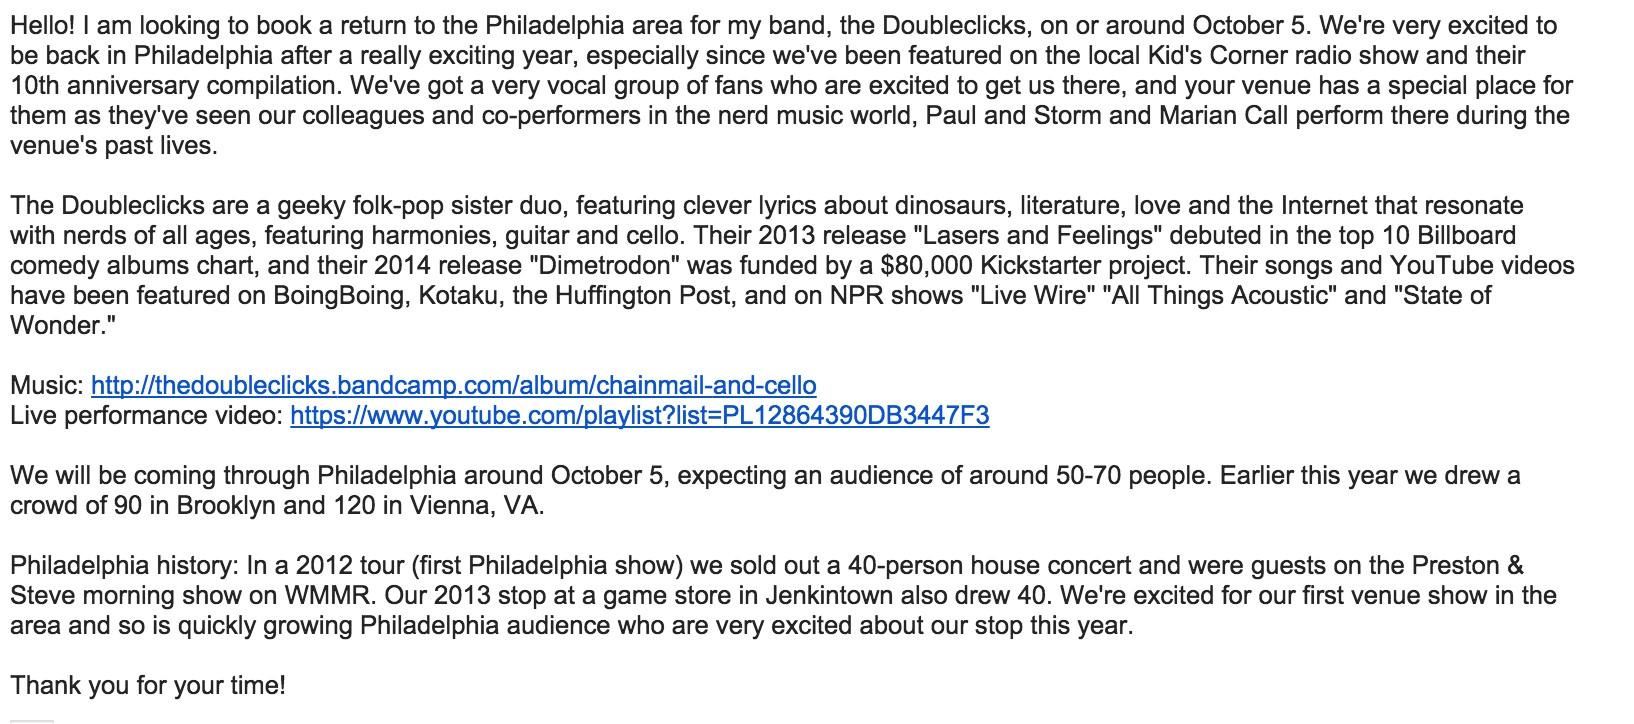 plan tour using internet fans